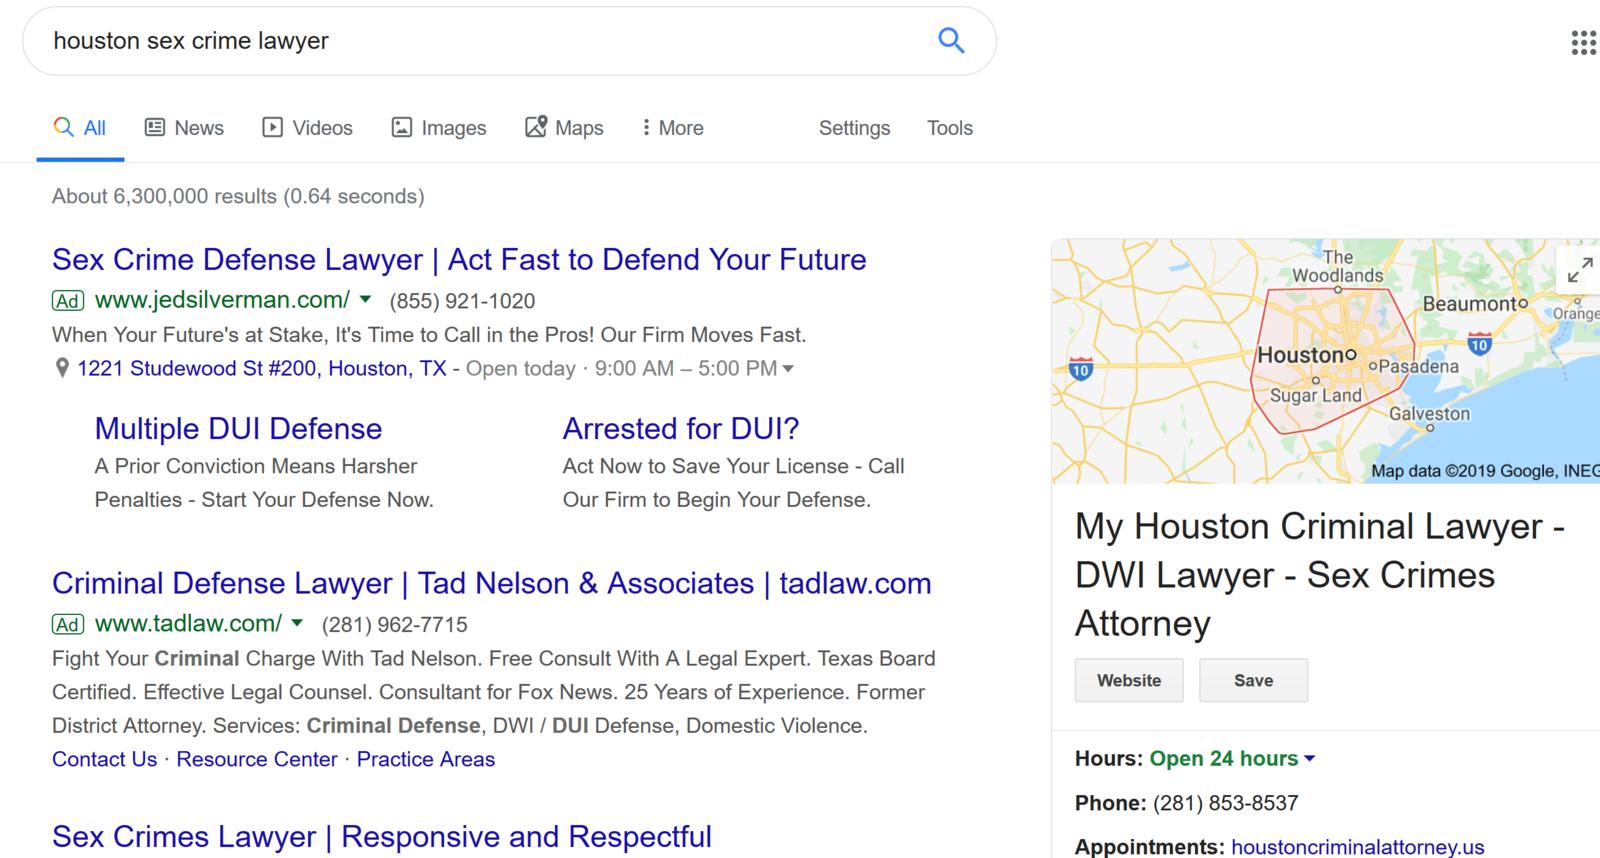 HoustonSexCrime-Google.png